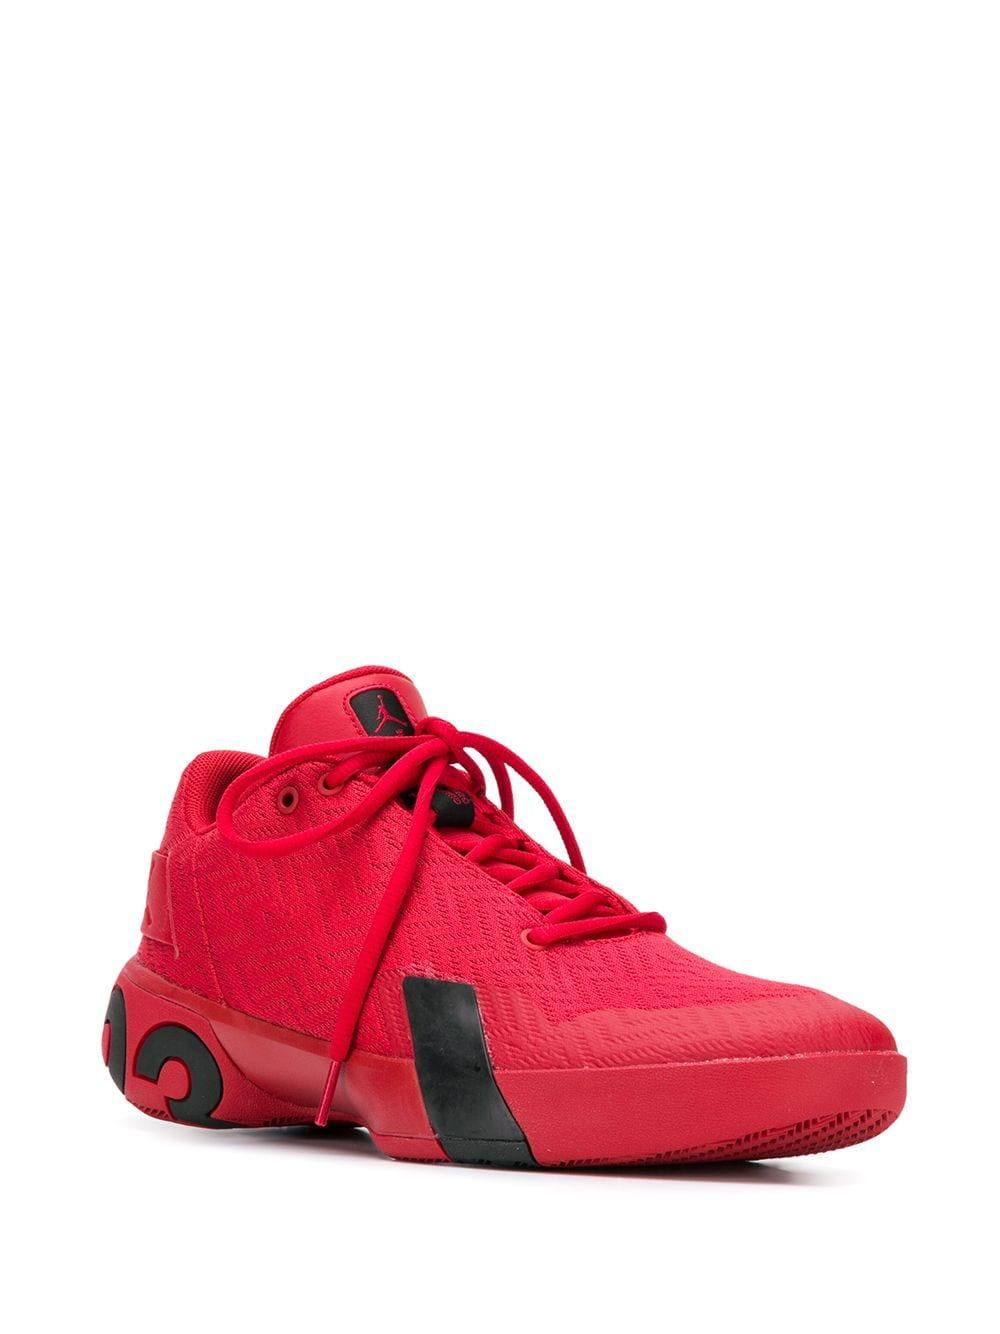 41bc0a5cb7d Nike - Red Jordan Ultra Fly 3 Low Sneakers for Men - Lyst. View fullscreen